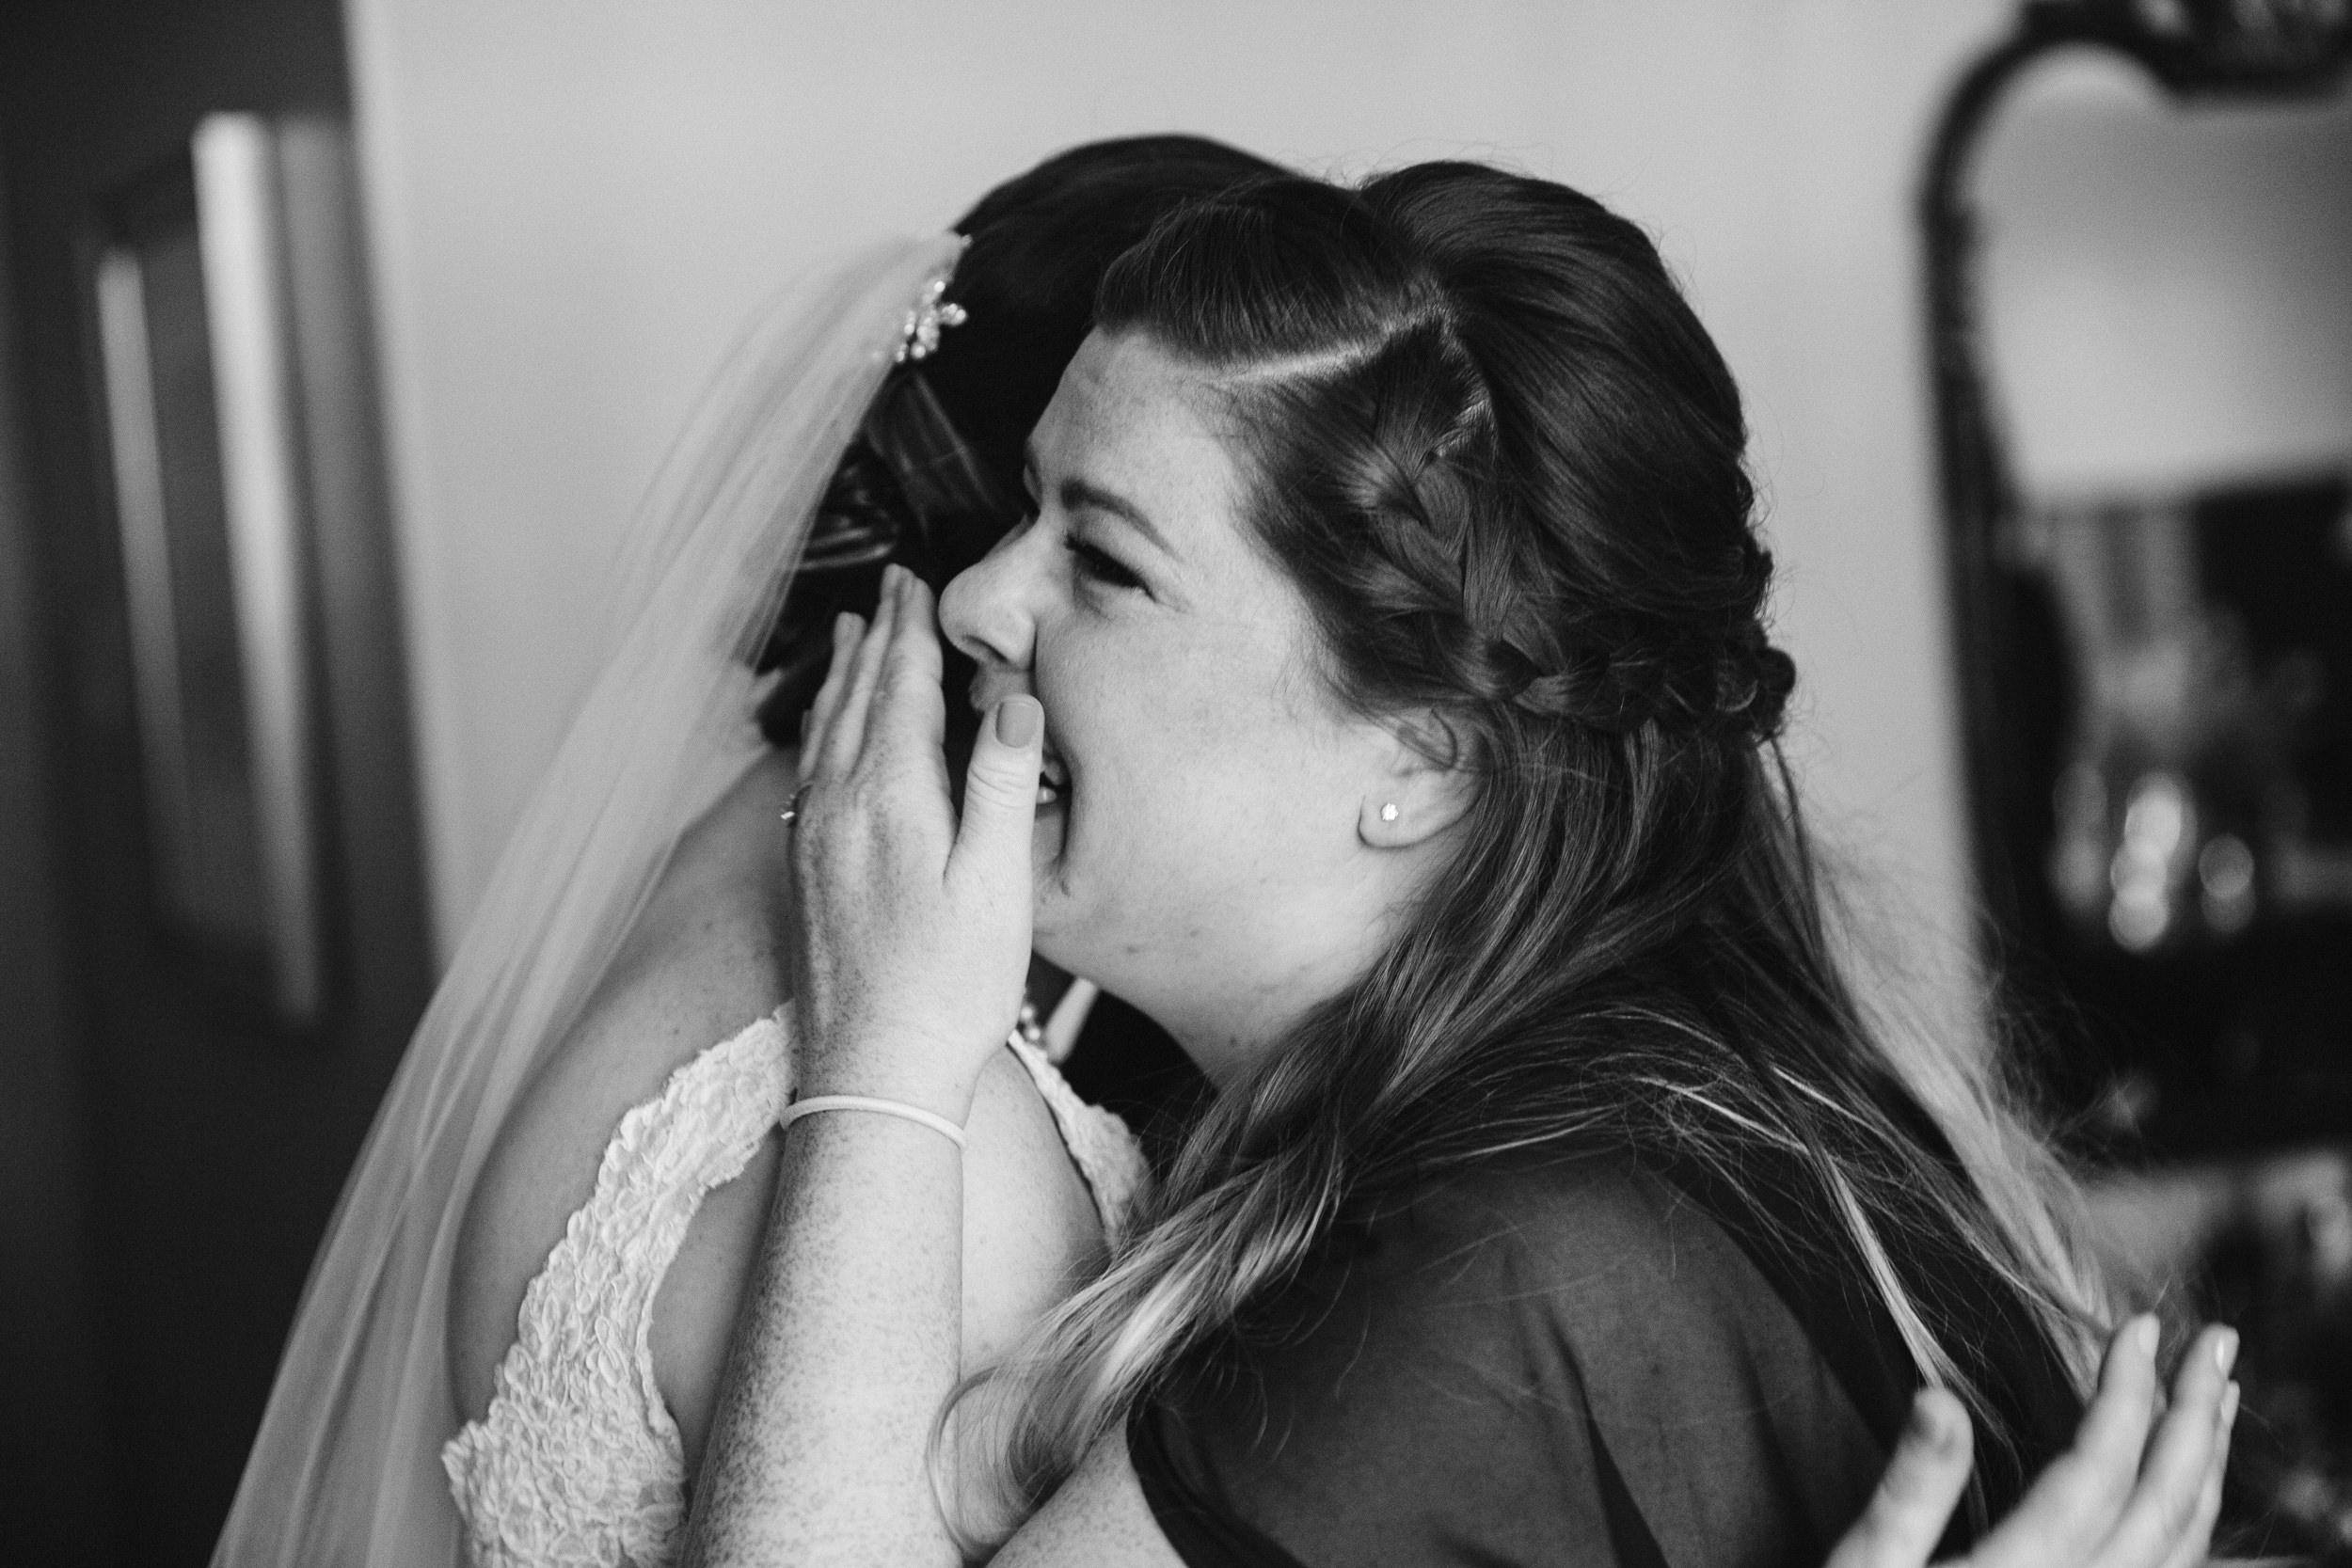 LK_Birmingham_AL_Wedding_2019-00015.jpg